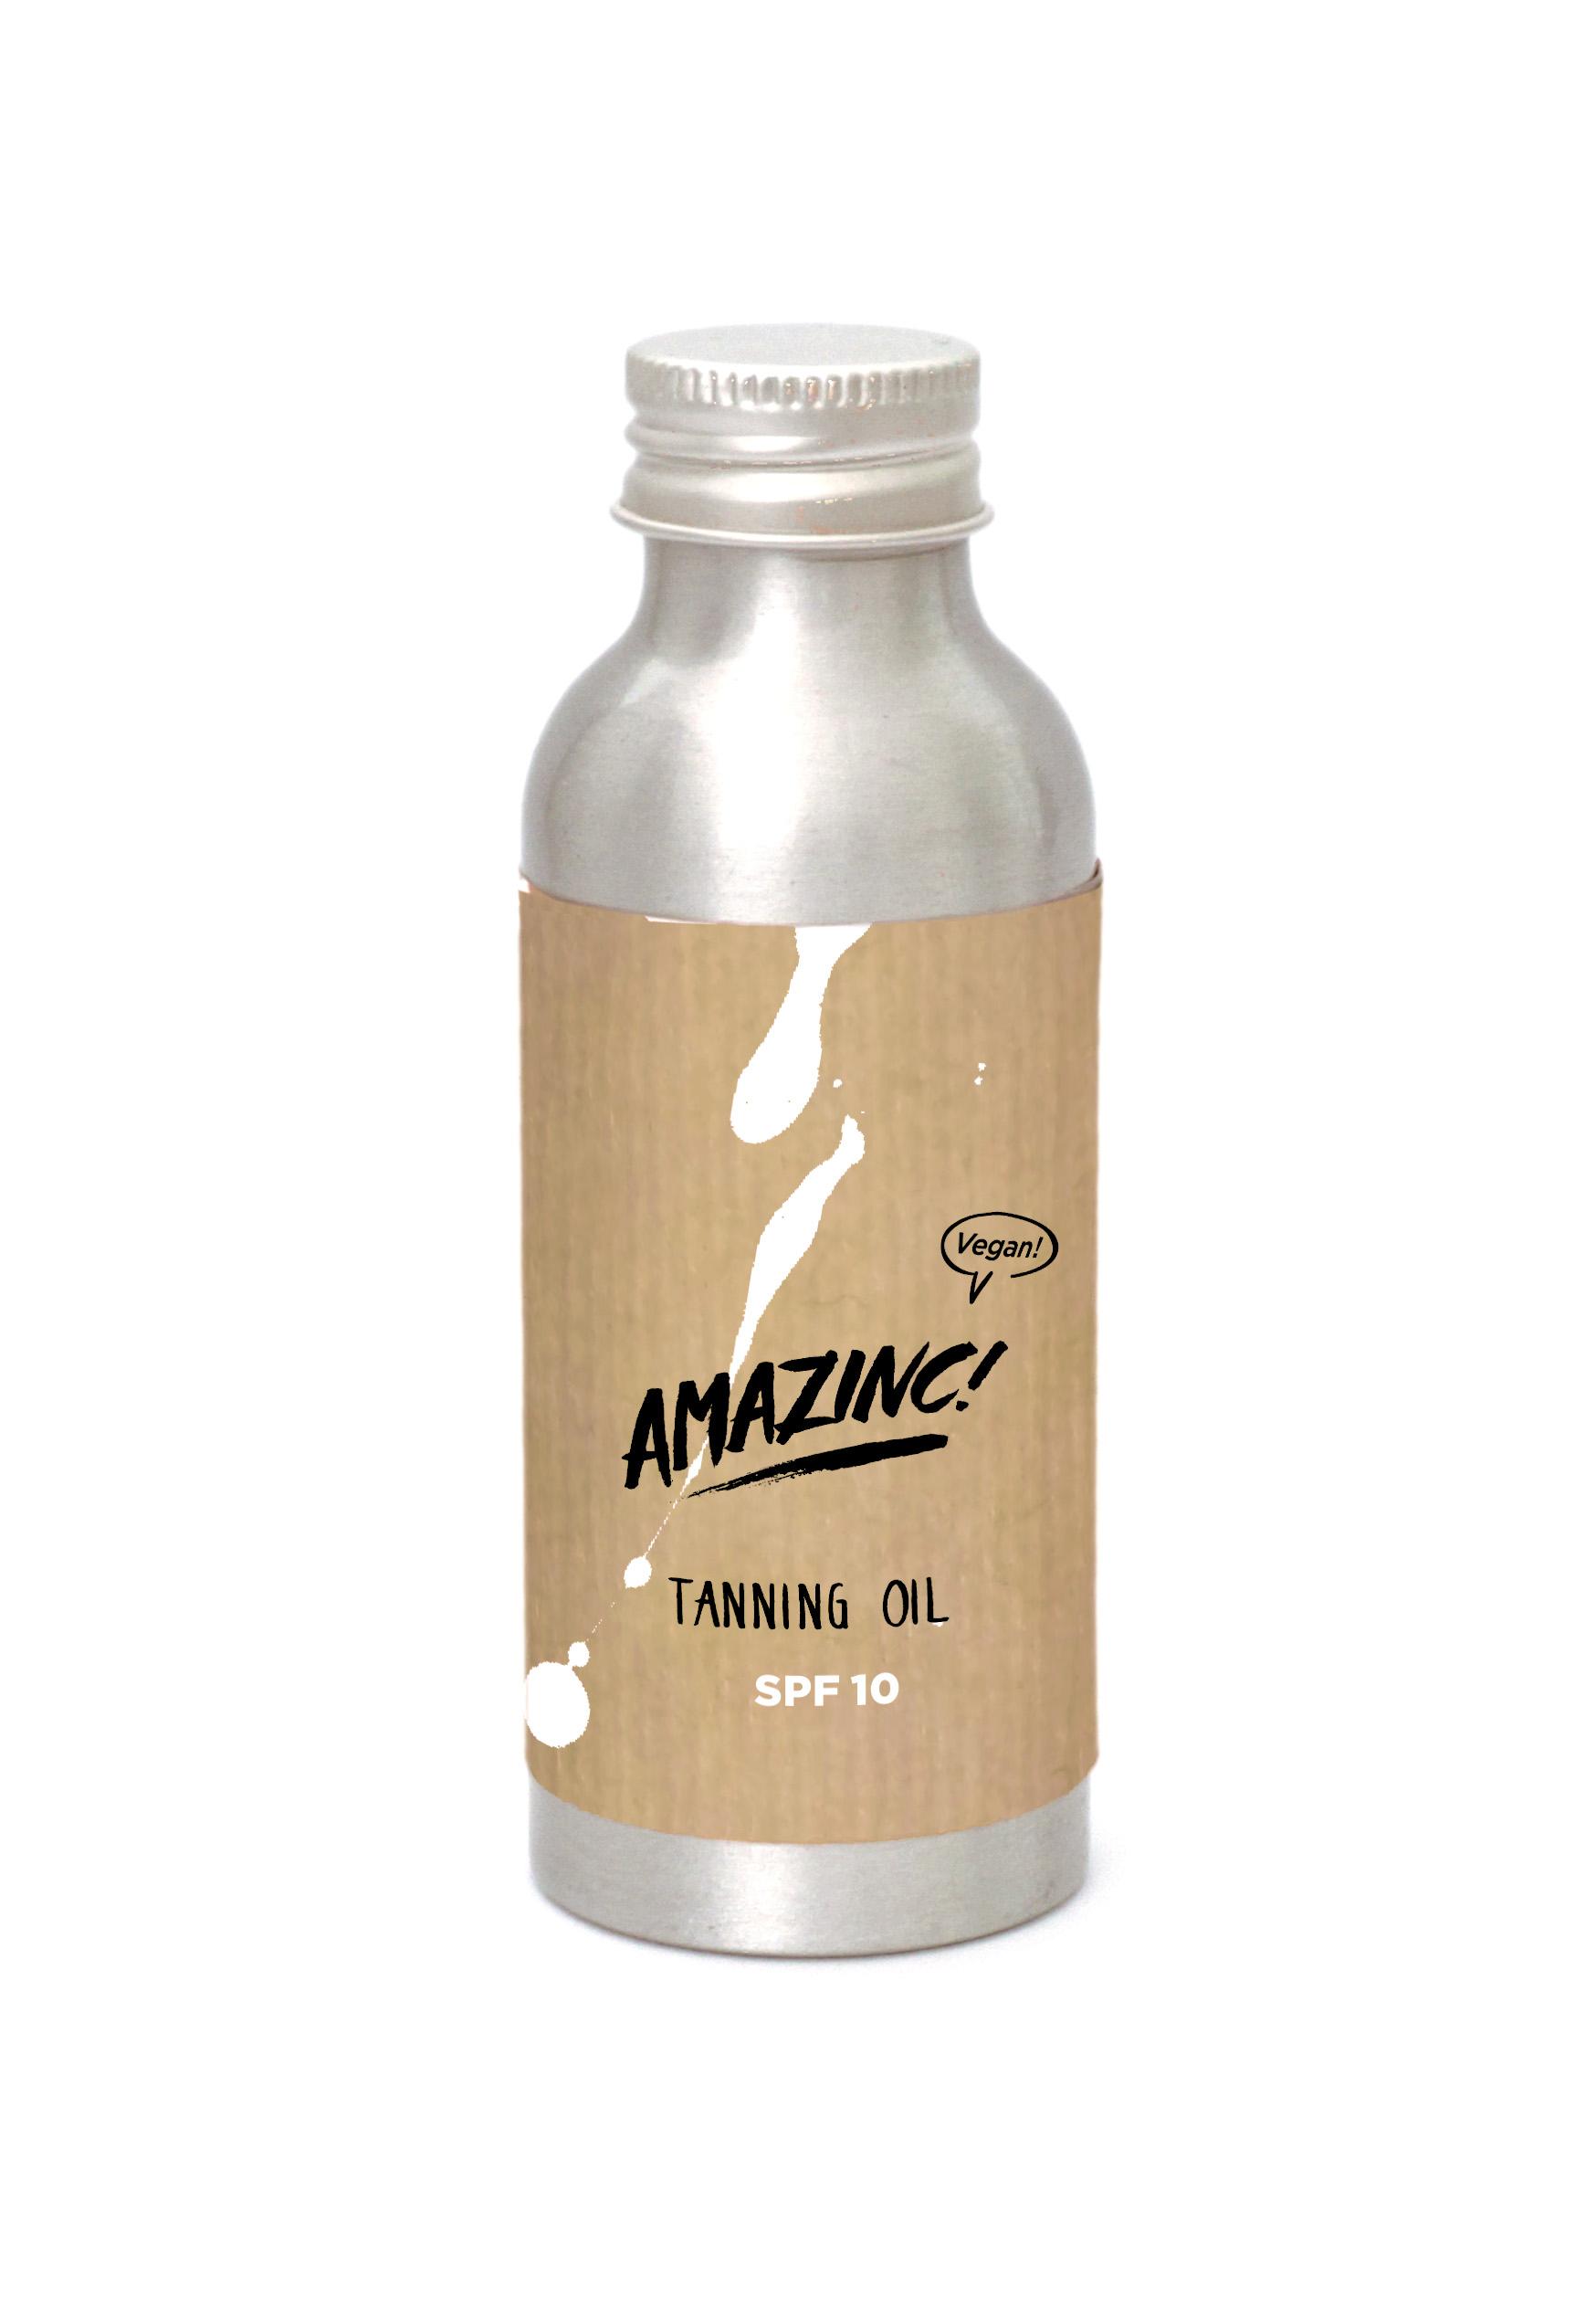 Amazinc Tanning Oil - Small - SPF 10+